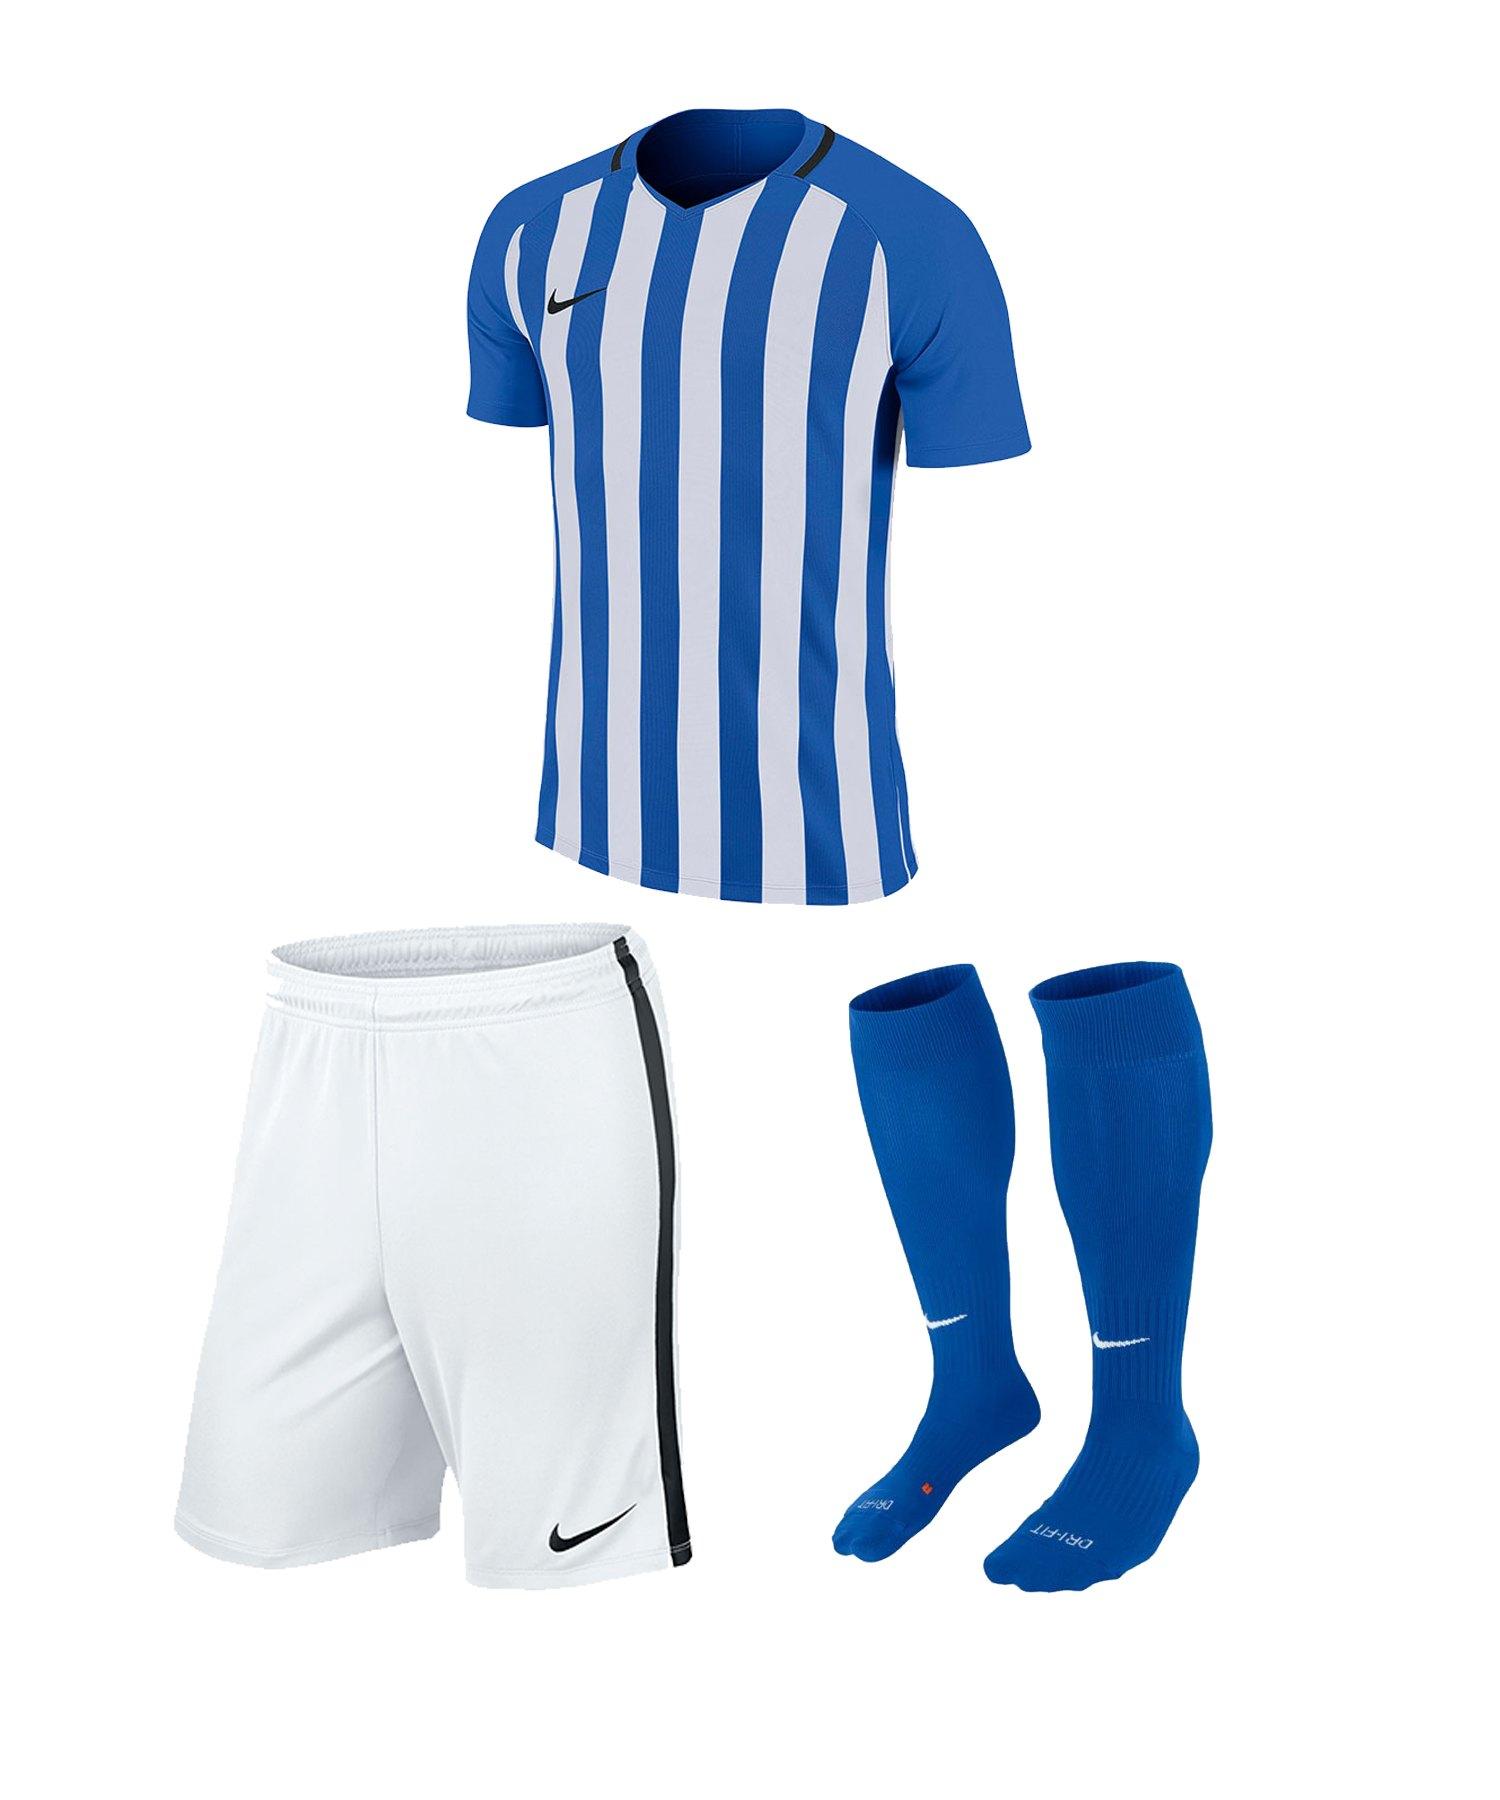 Nike Striped Division III Trikotset kurz Kids F464 - blau